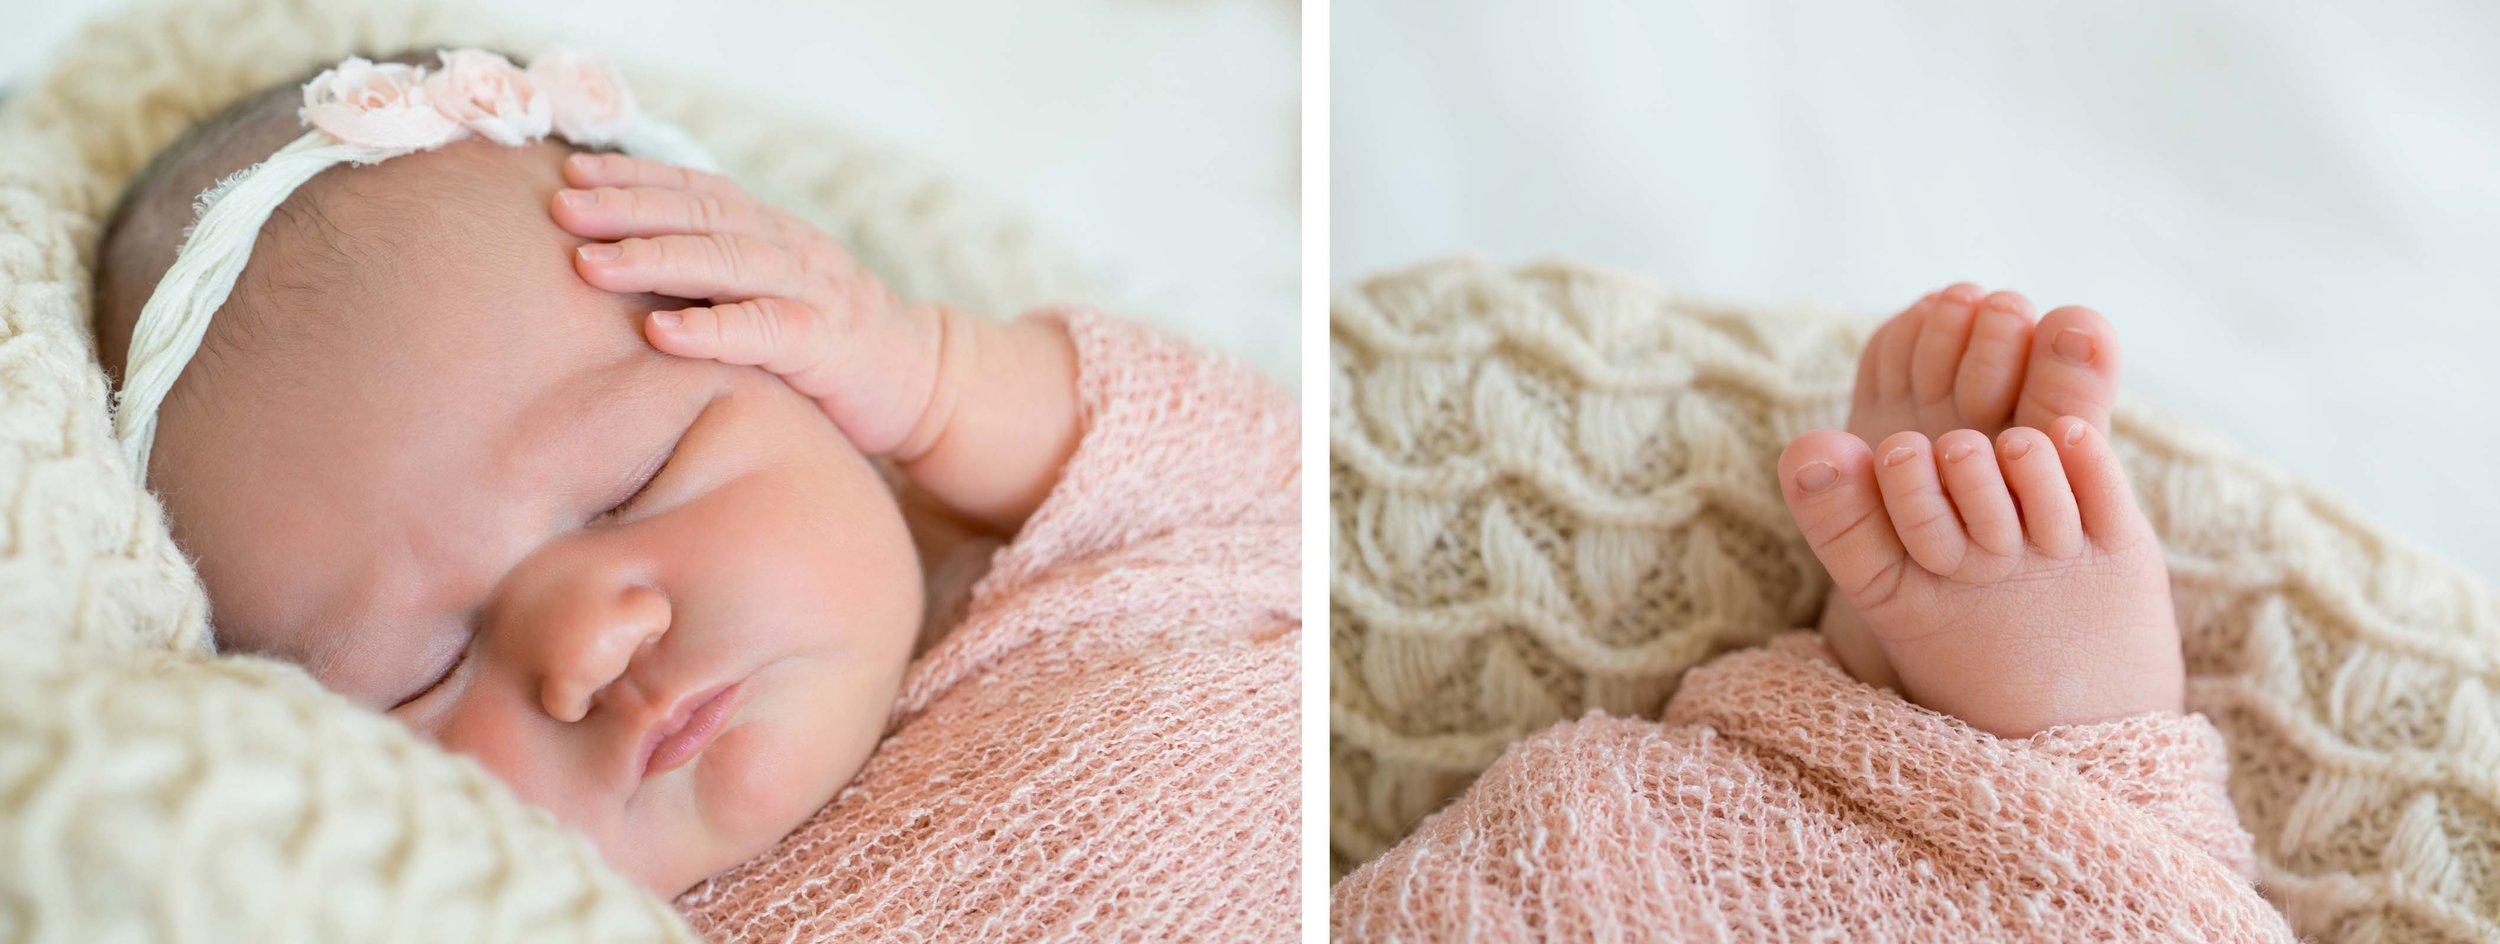 tender-newborn-moments.jpg